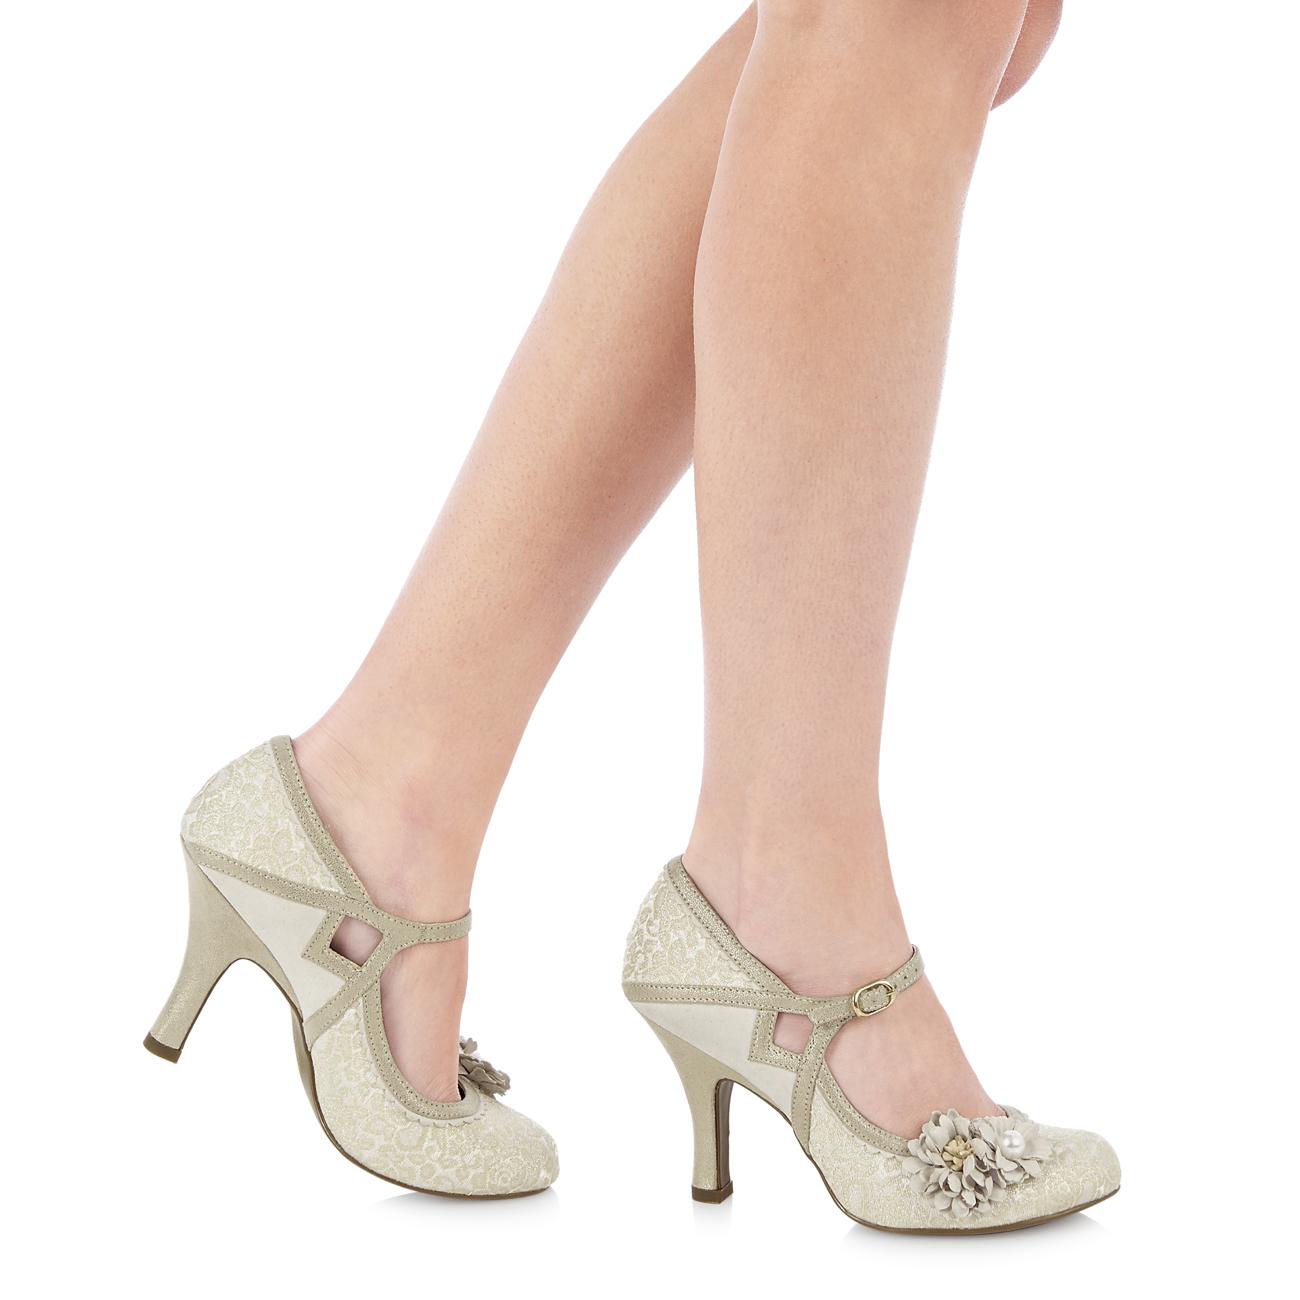 Ruby Shoo Luxury Brocade Yasmin Mary Jane  3-9 Cream Rose Gold Aqua Bridal